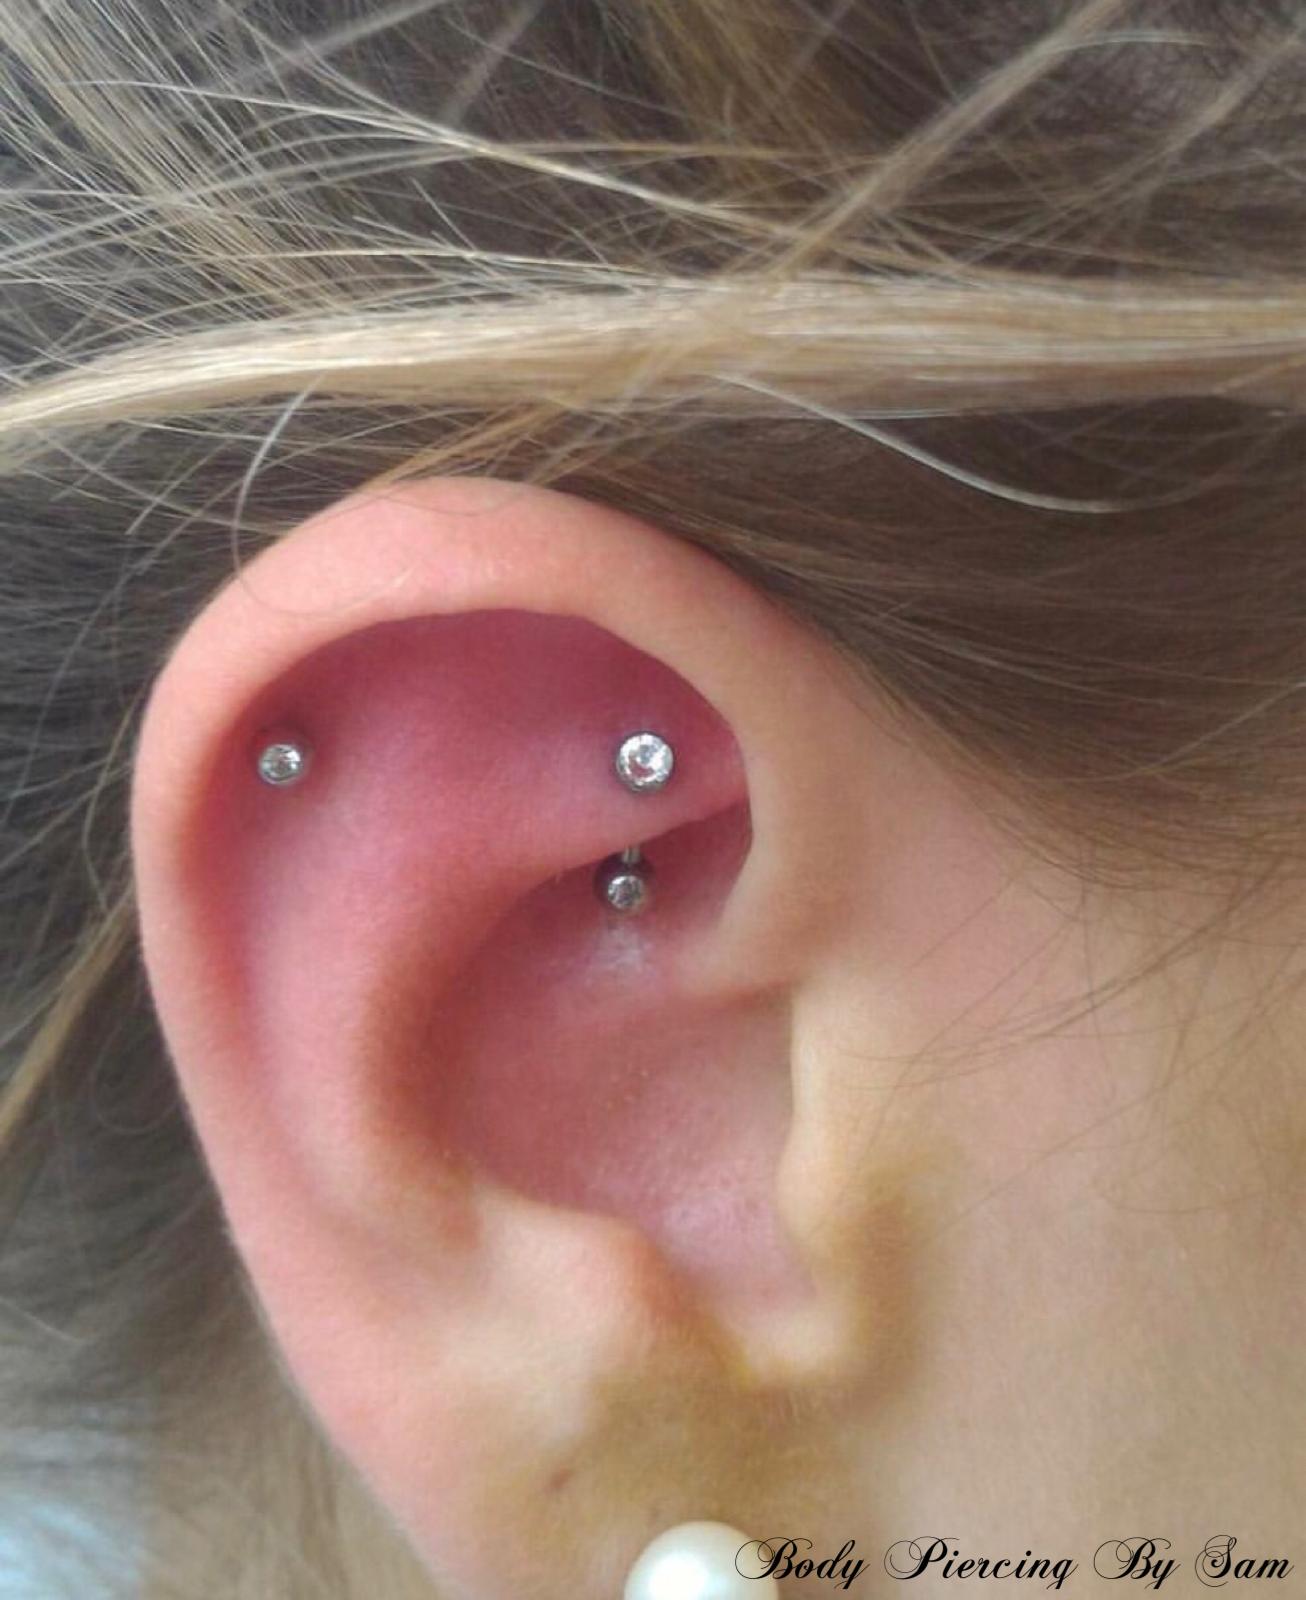 Nose piercing post  piercing piercings pierced piercer titanium implant shiny